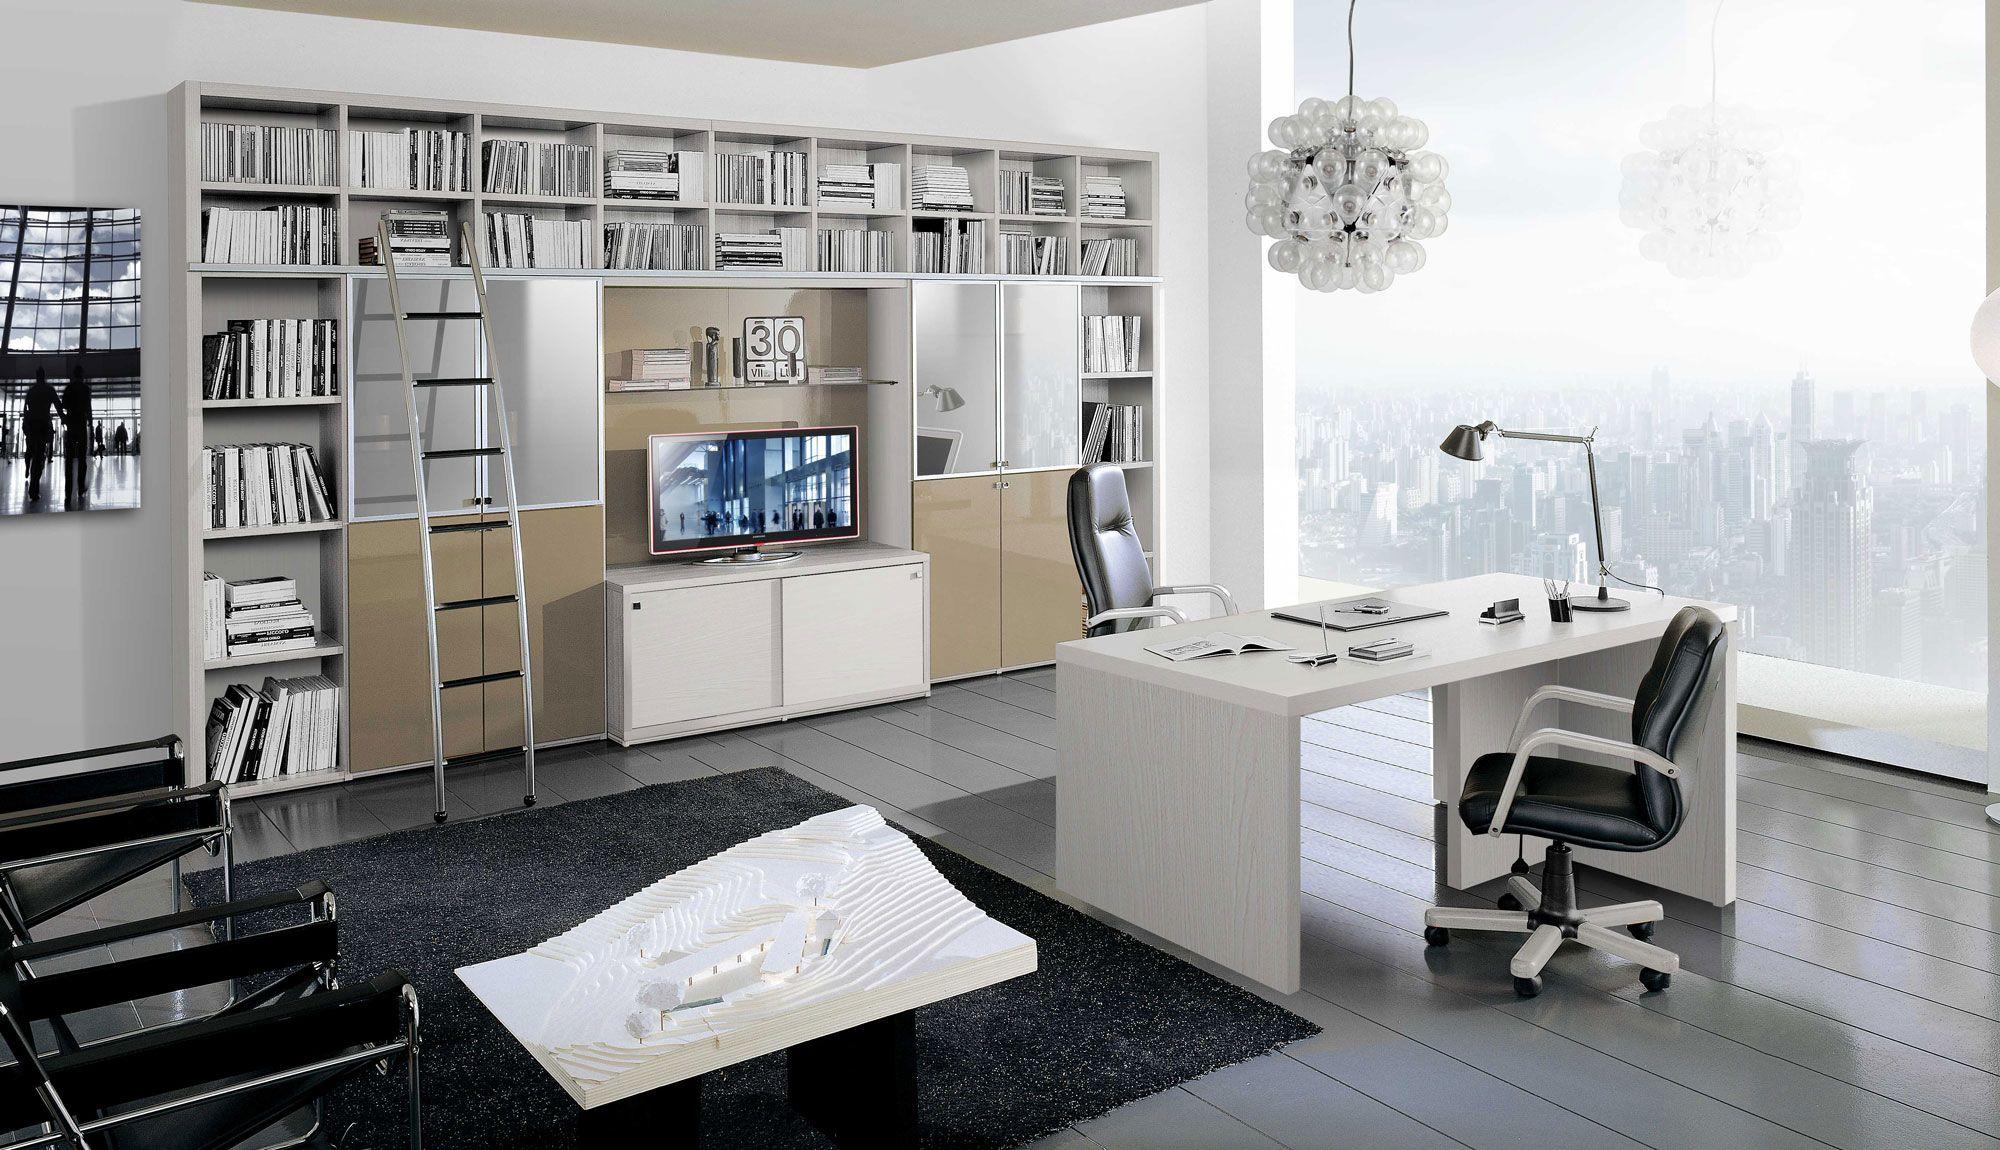 Ikea Ufficio In Casa : Ikea ufficio in casa casa fai da te